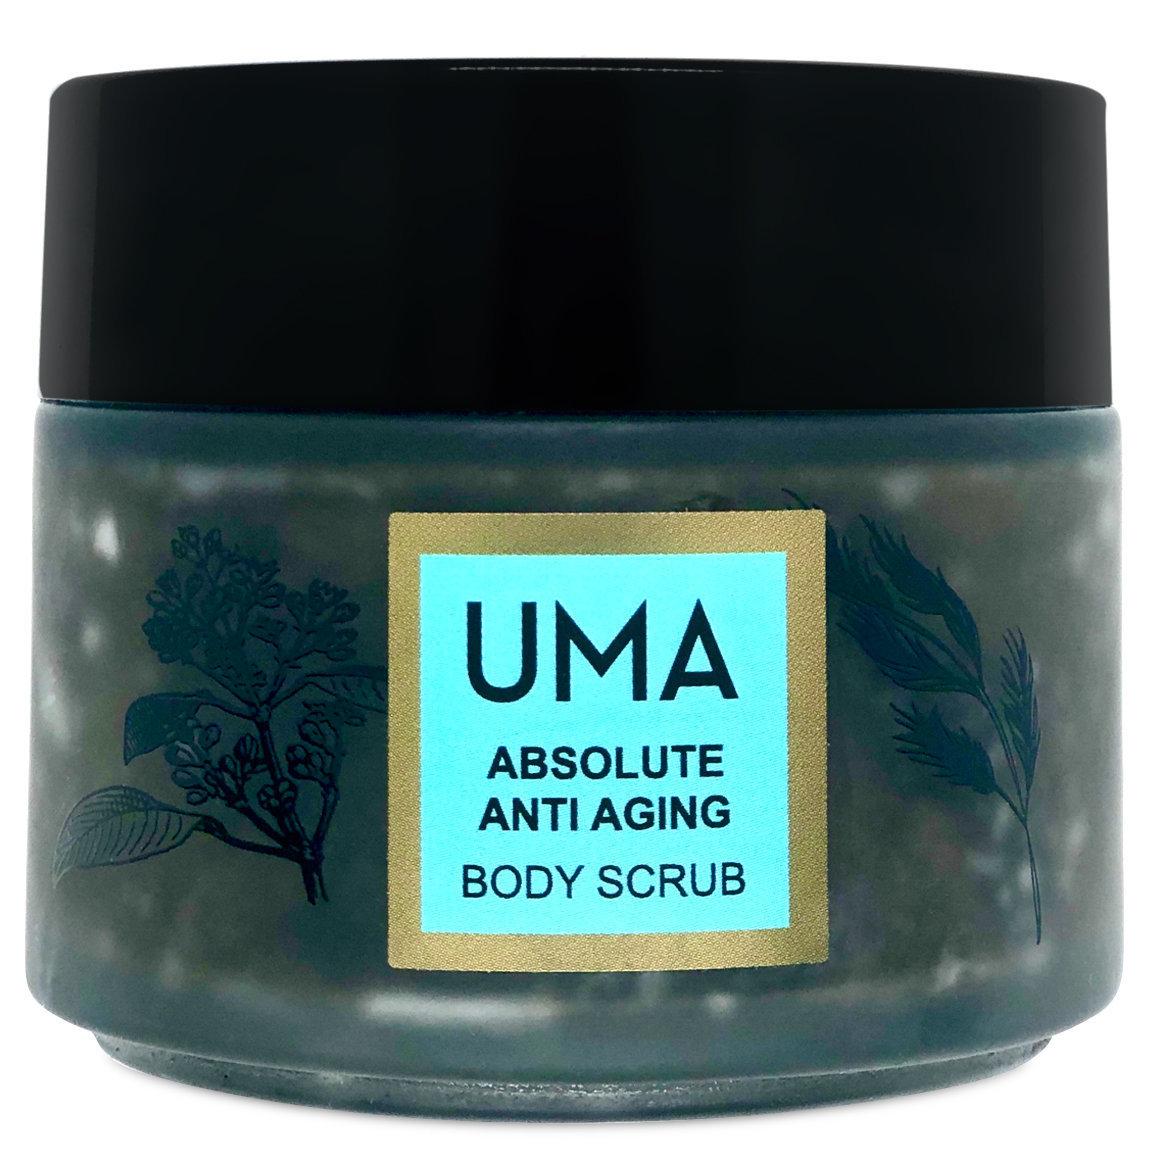 Uma Absolute Anti-Aging Body Scrub alternative view 1 - product swatch.